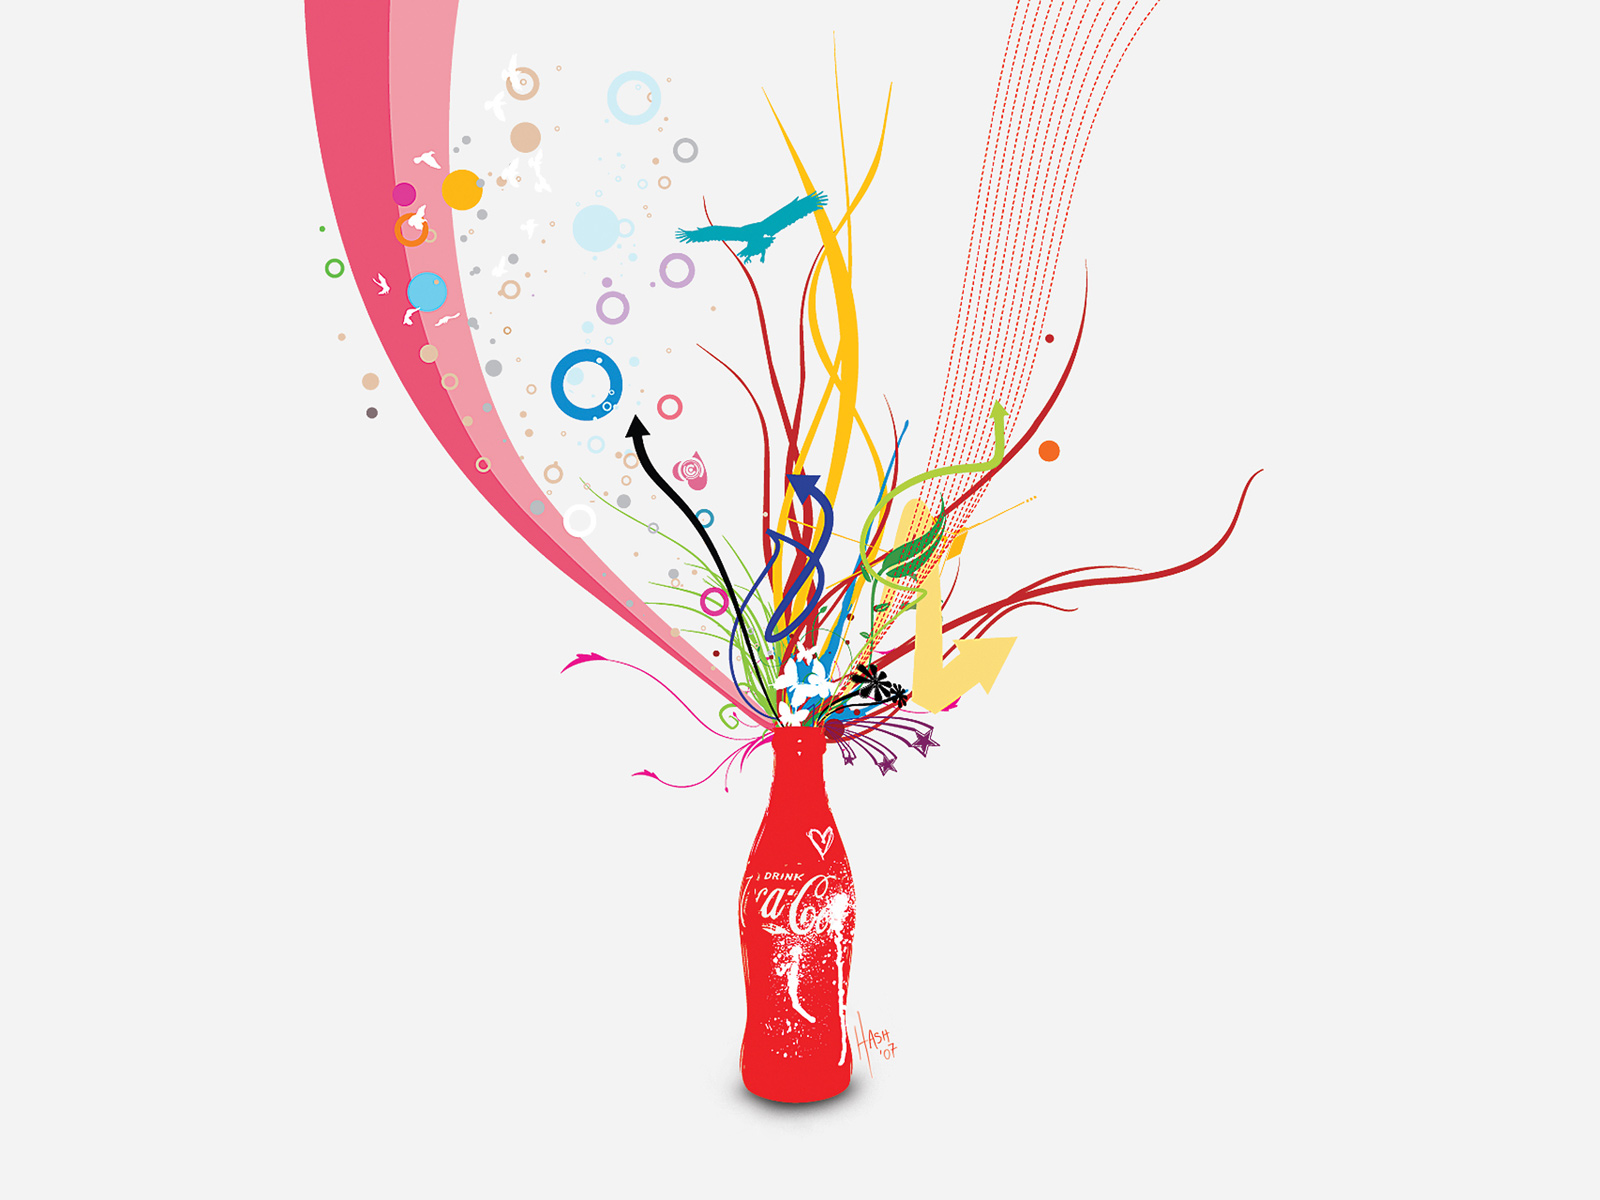 Real Coke Unleashed